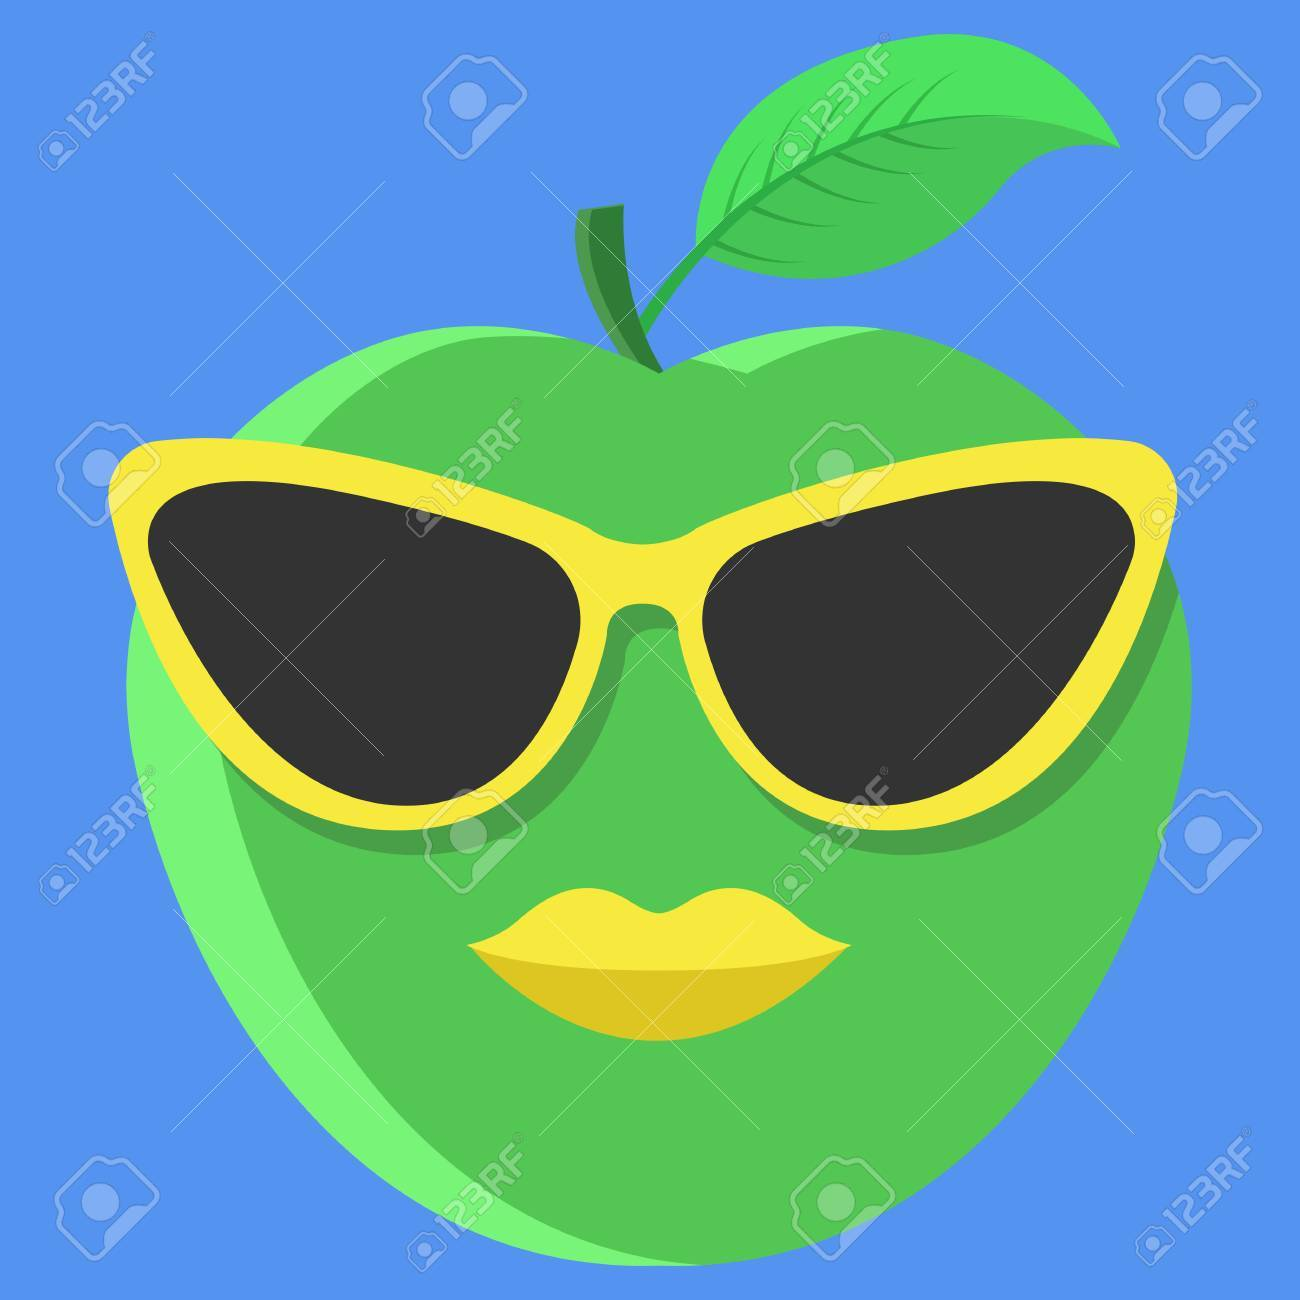 a93c92eafeeb3 Vector - Vector green apple cartoon. Apple with glasses. Apple with lips.  Apple Fashion. Apple isolated. Apple icon.